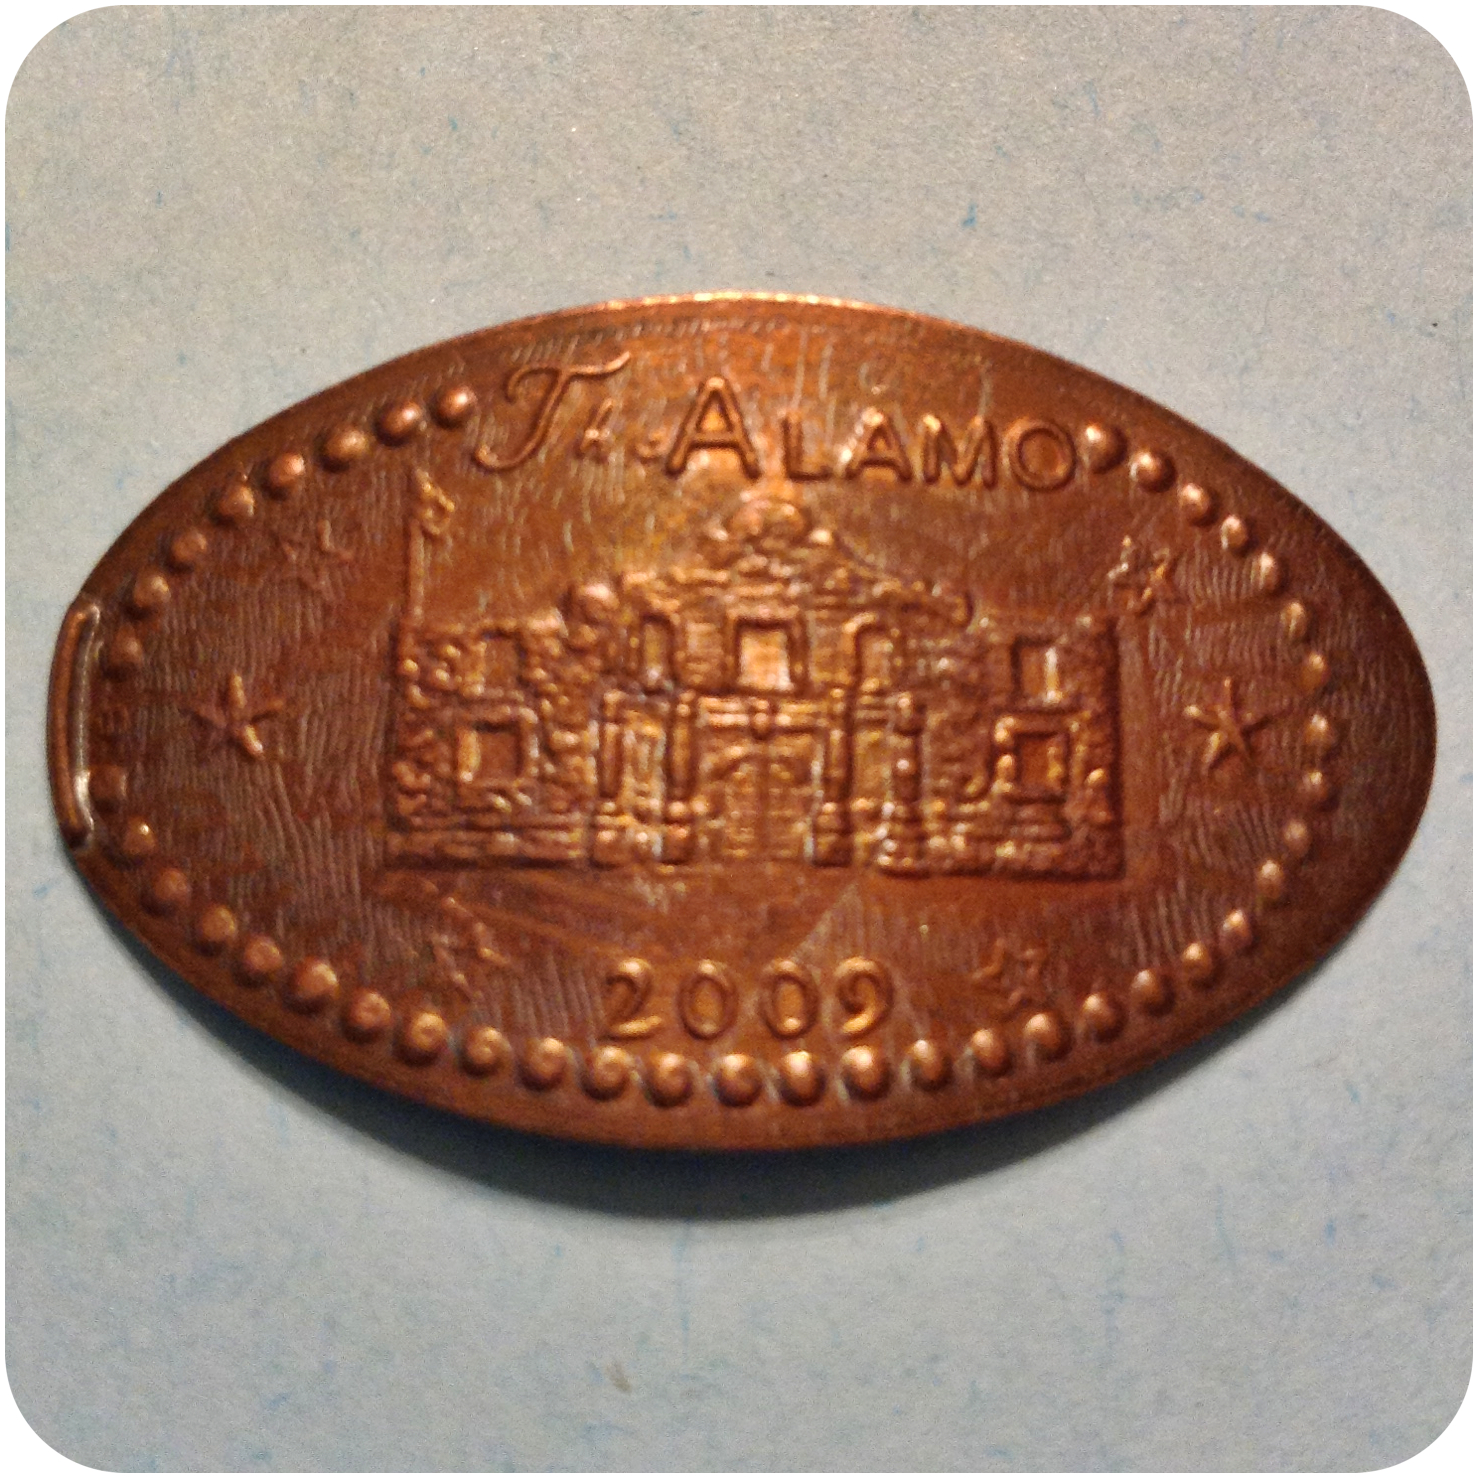 Retired The Alamo Dated 2009 With Six Stars, San Antonio TX Texas Elongated Coin